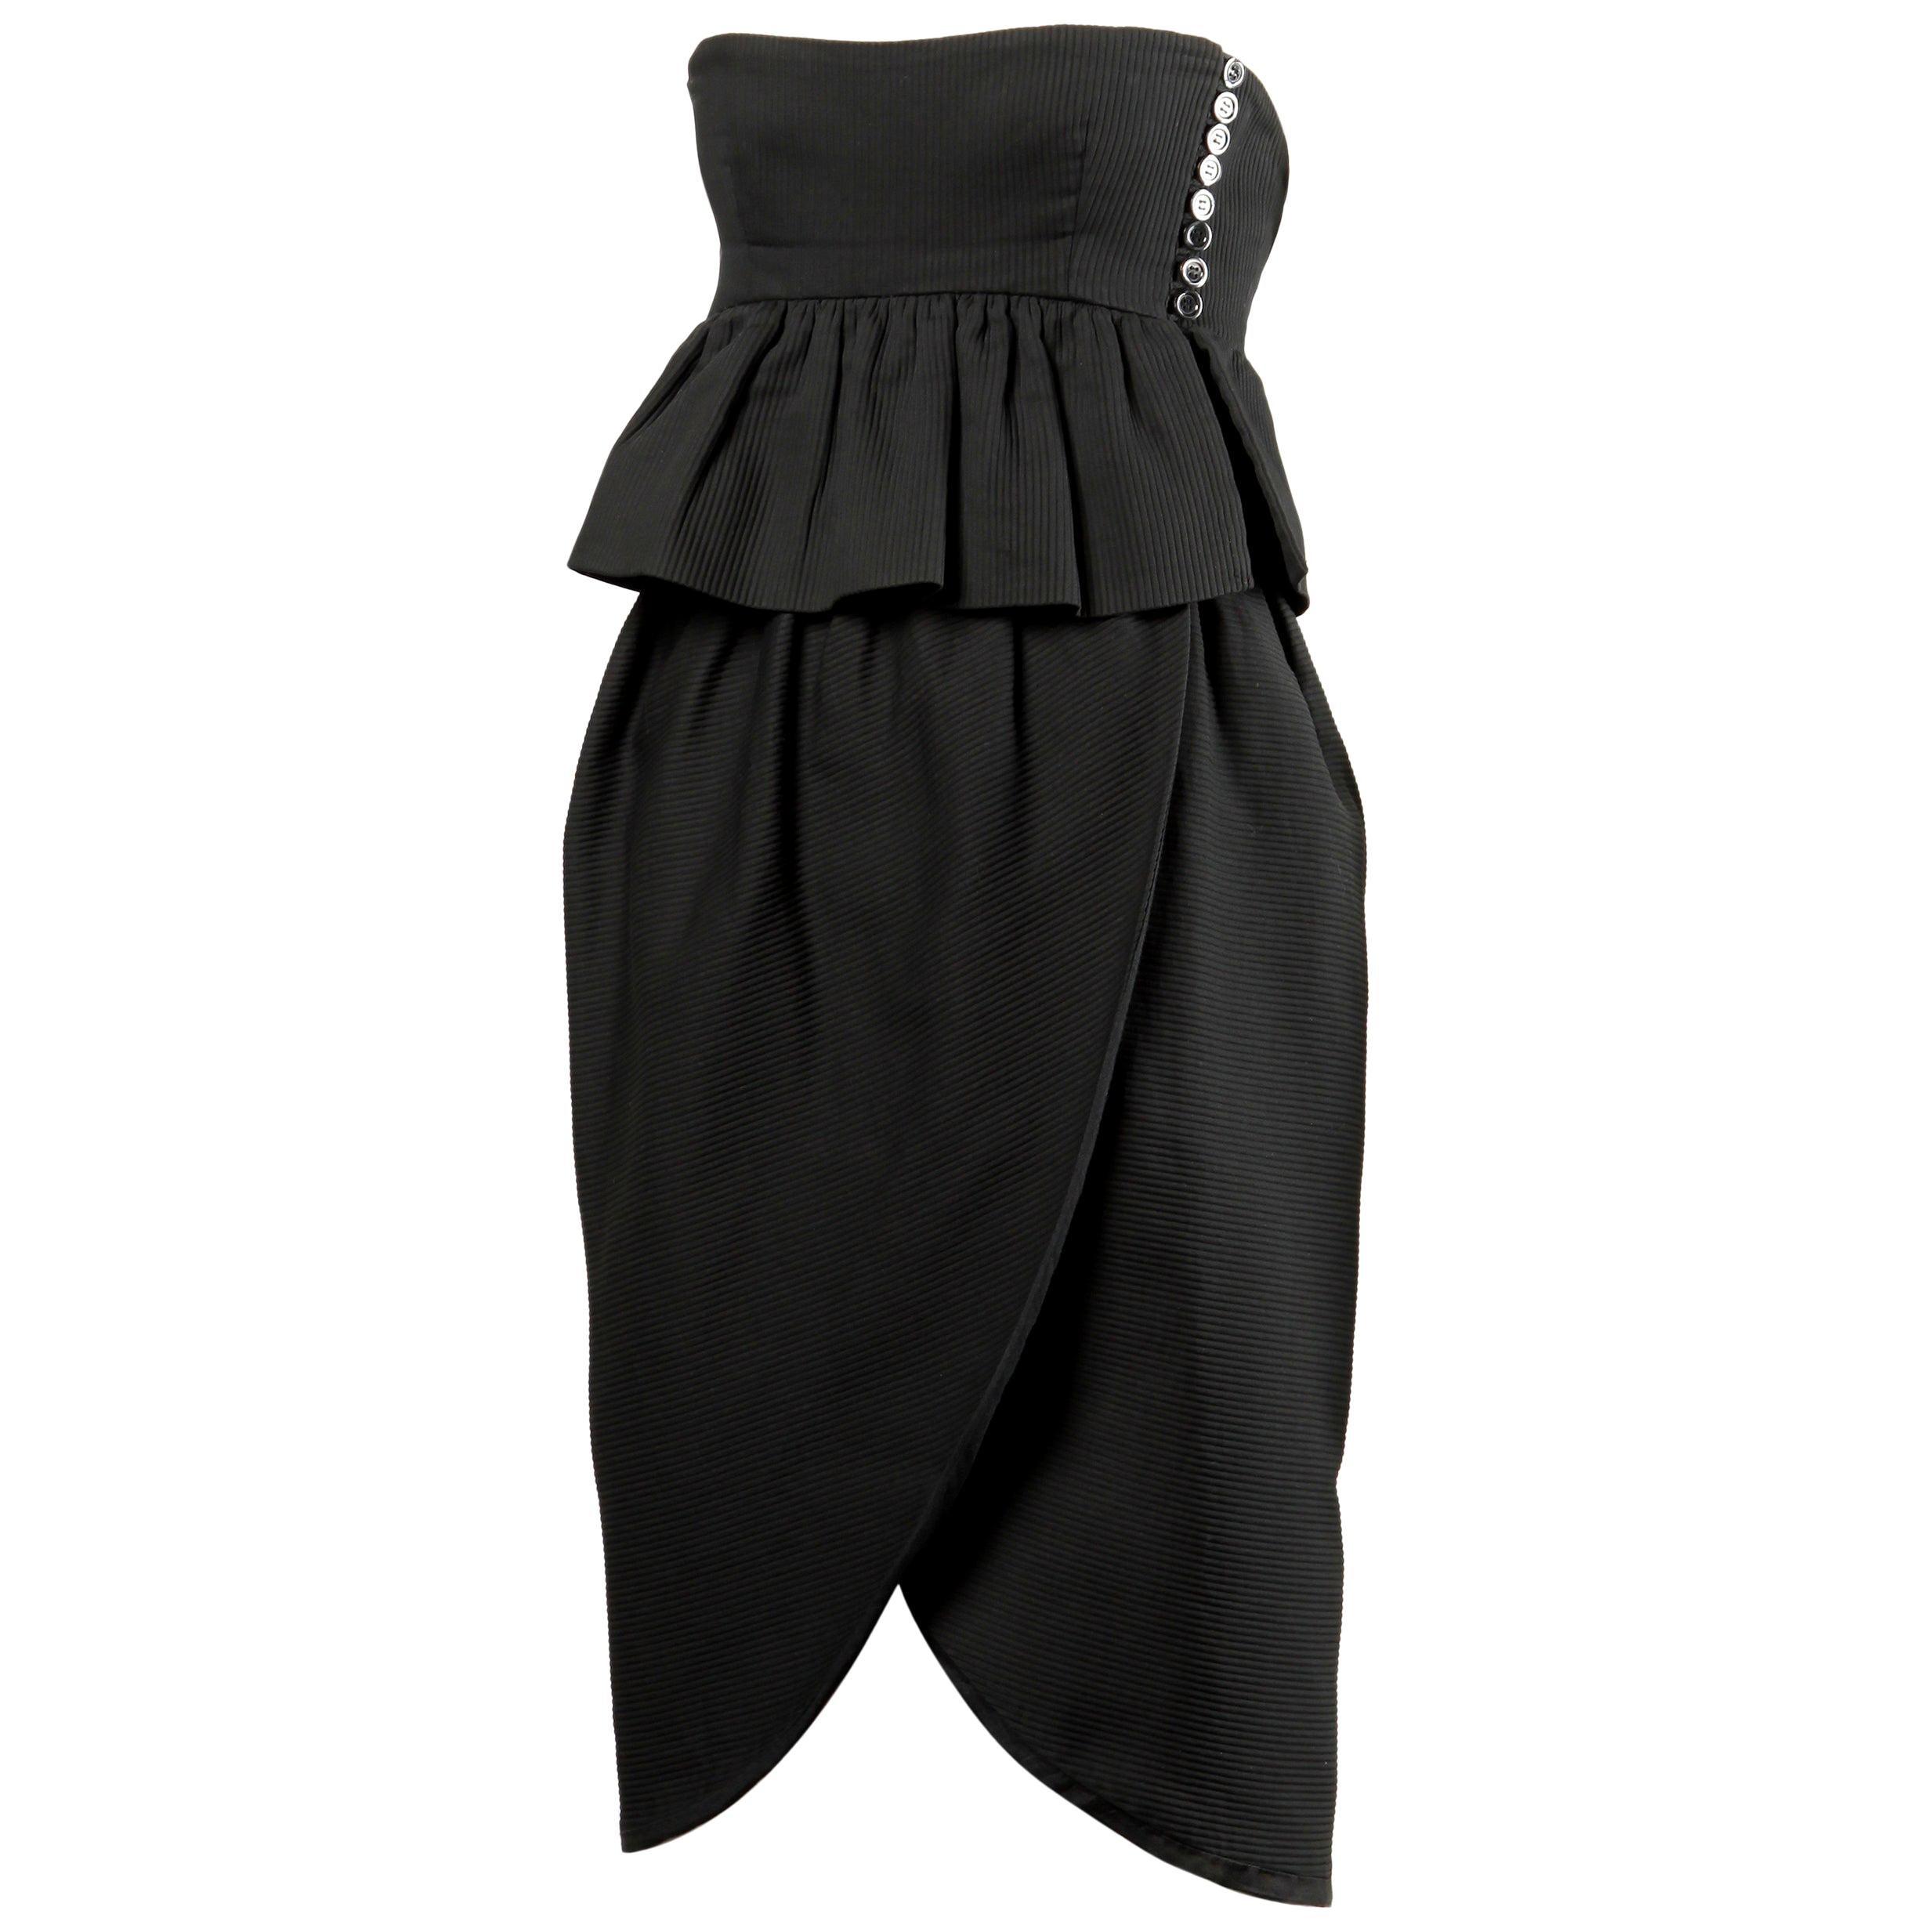 Lanvin 1980s Vintage Strapless Little Black Dress with Peplum